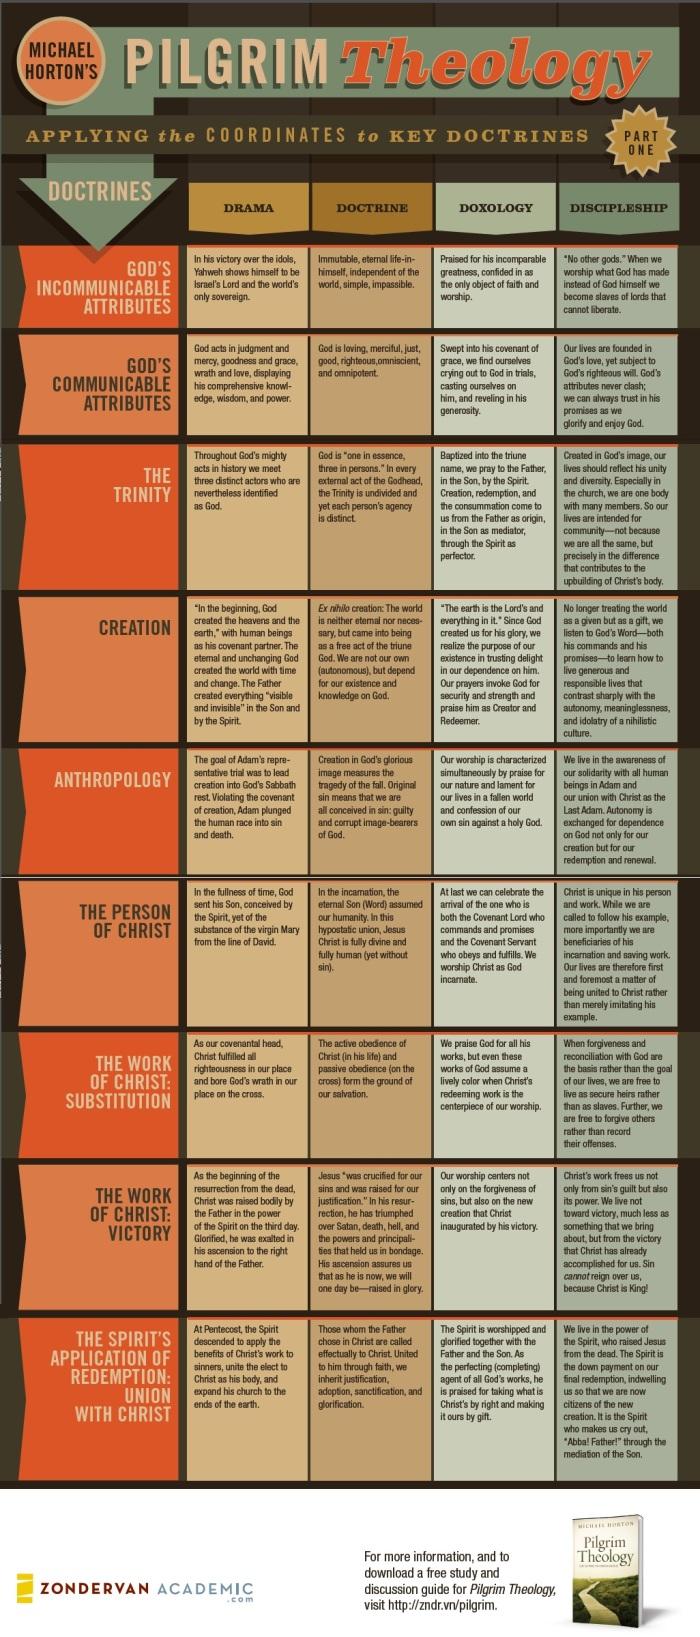 Pilgrim theology infographic